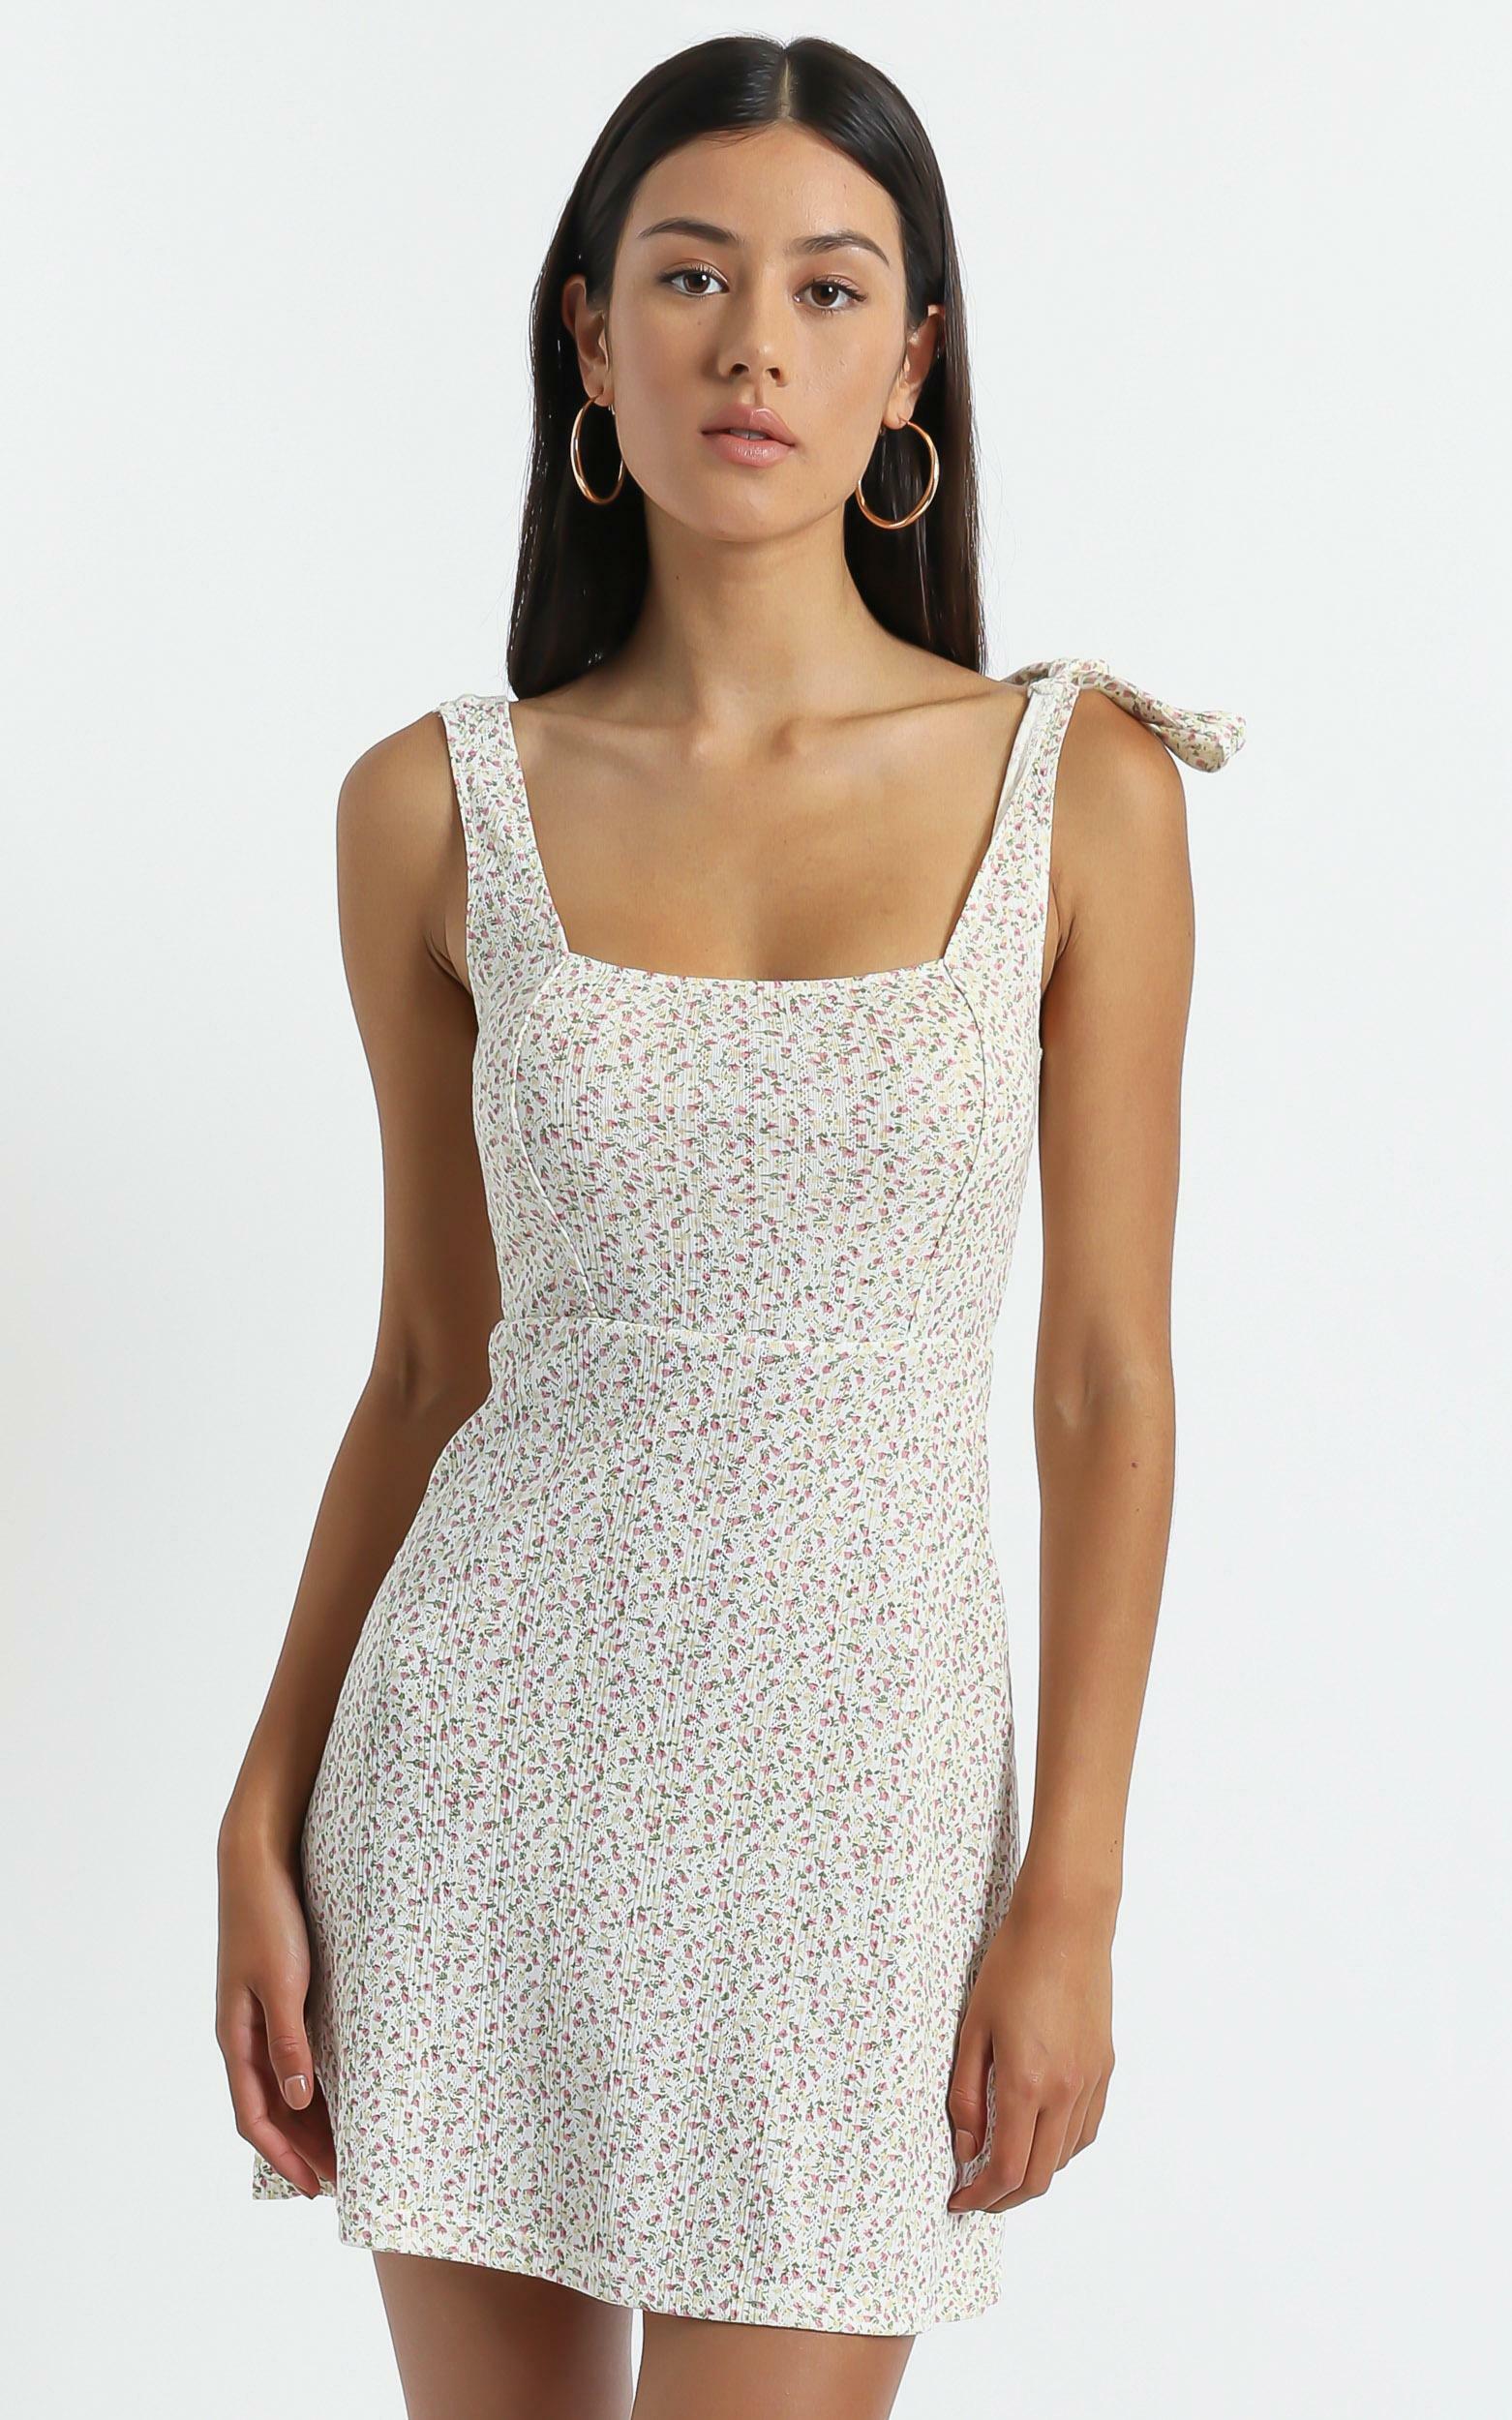 Sadira Dress in White Floral - 06, WHT2, hi-res image number null